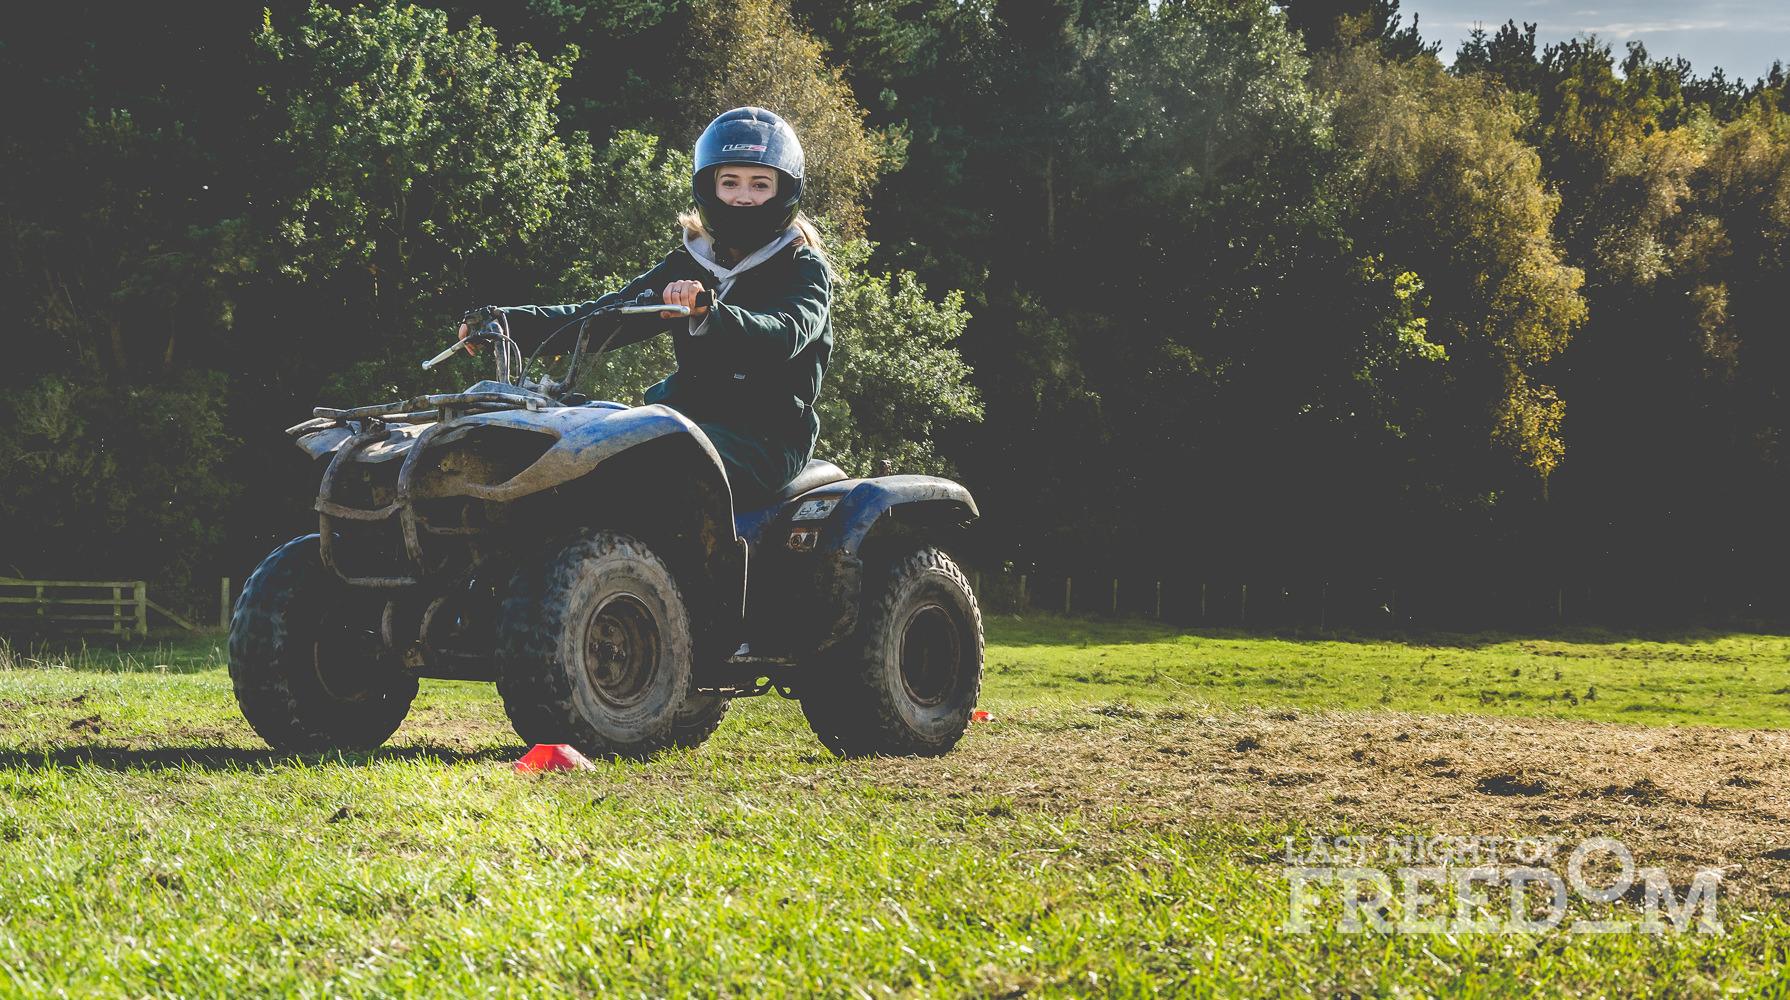 A girl sitting on a quad bike